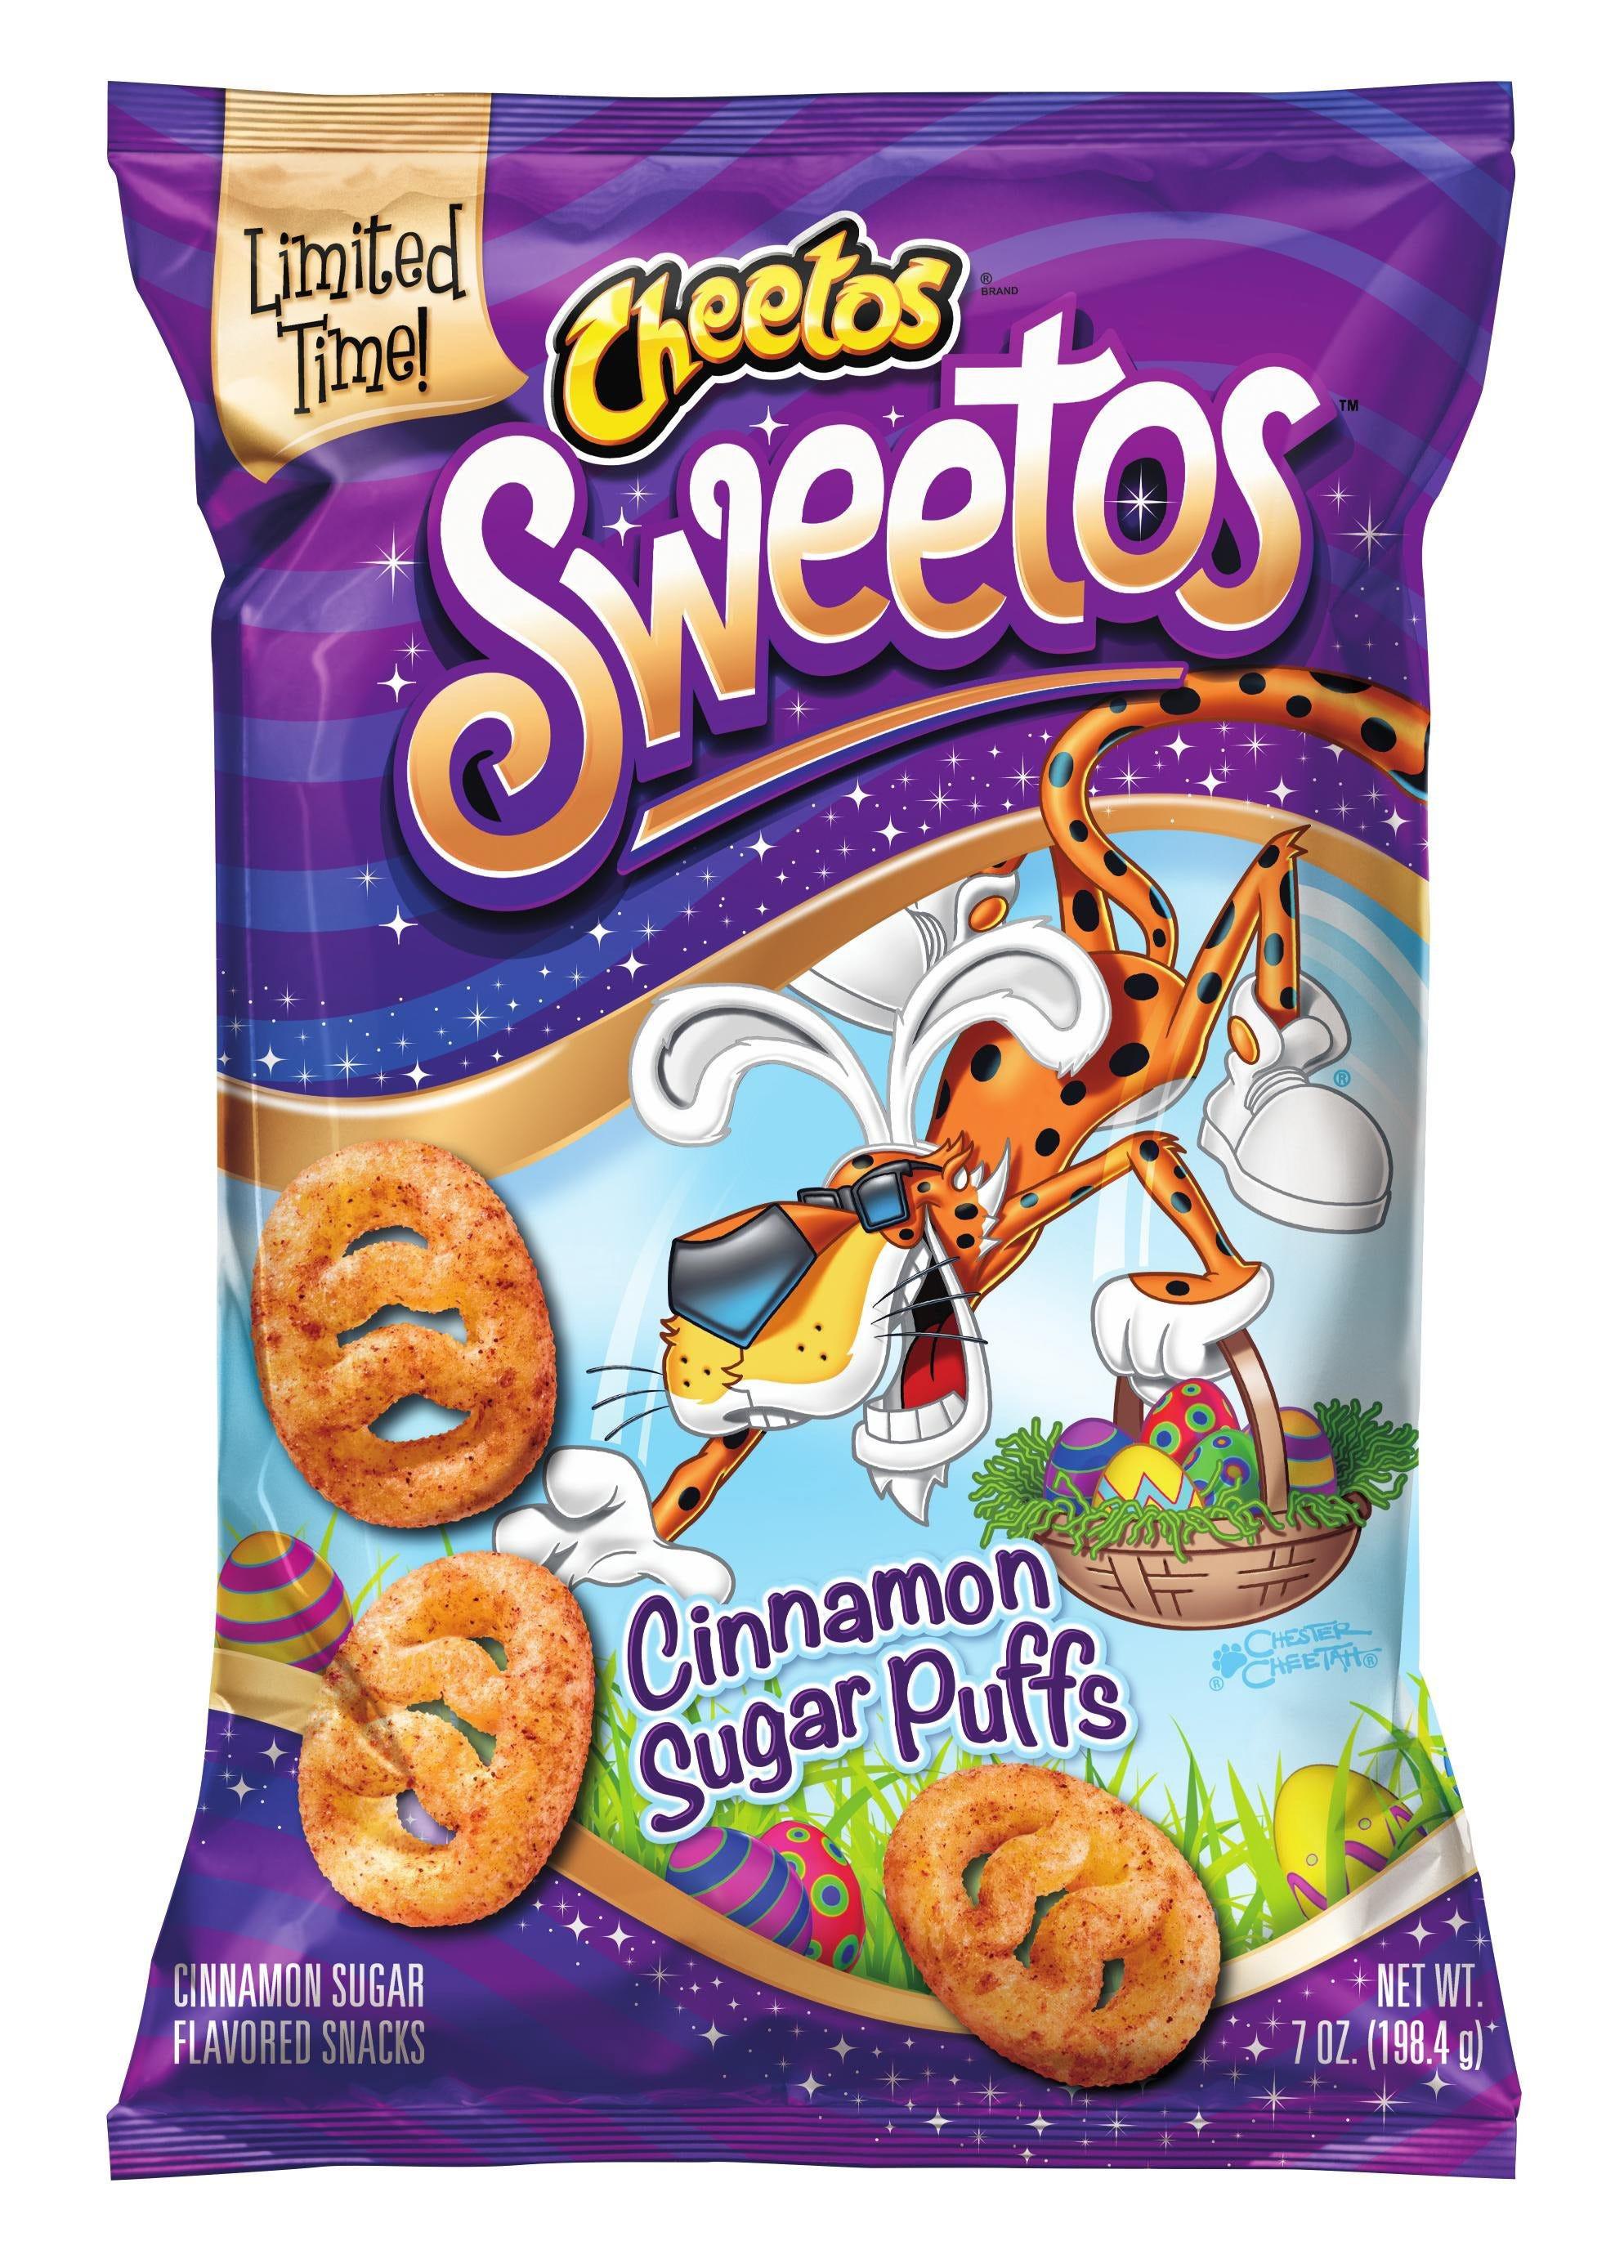 Cheetos easter